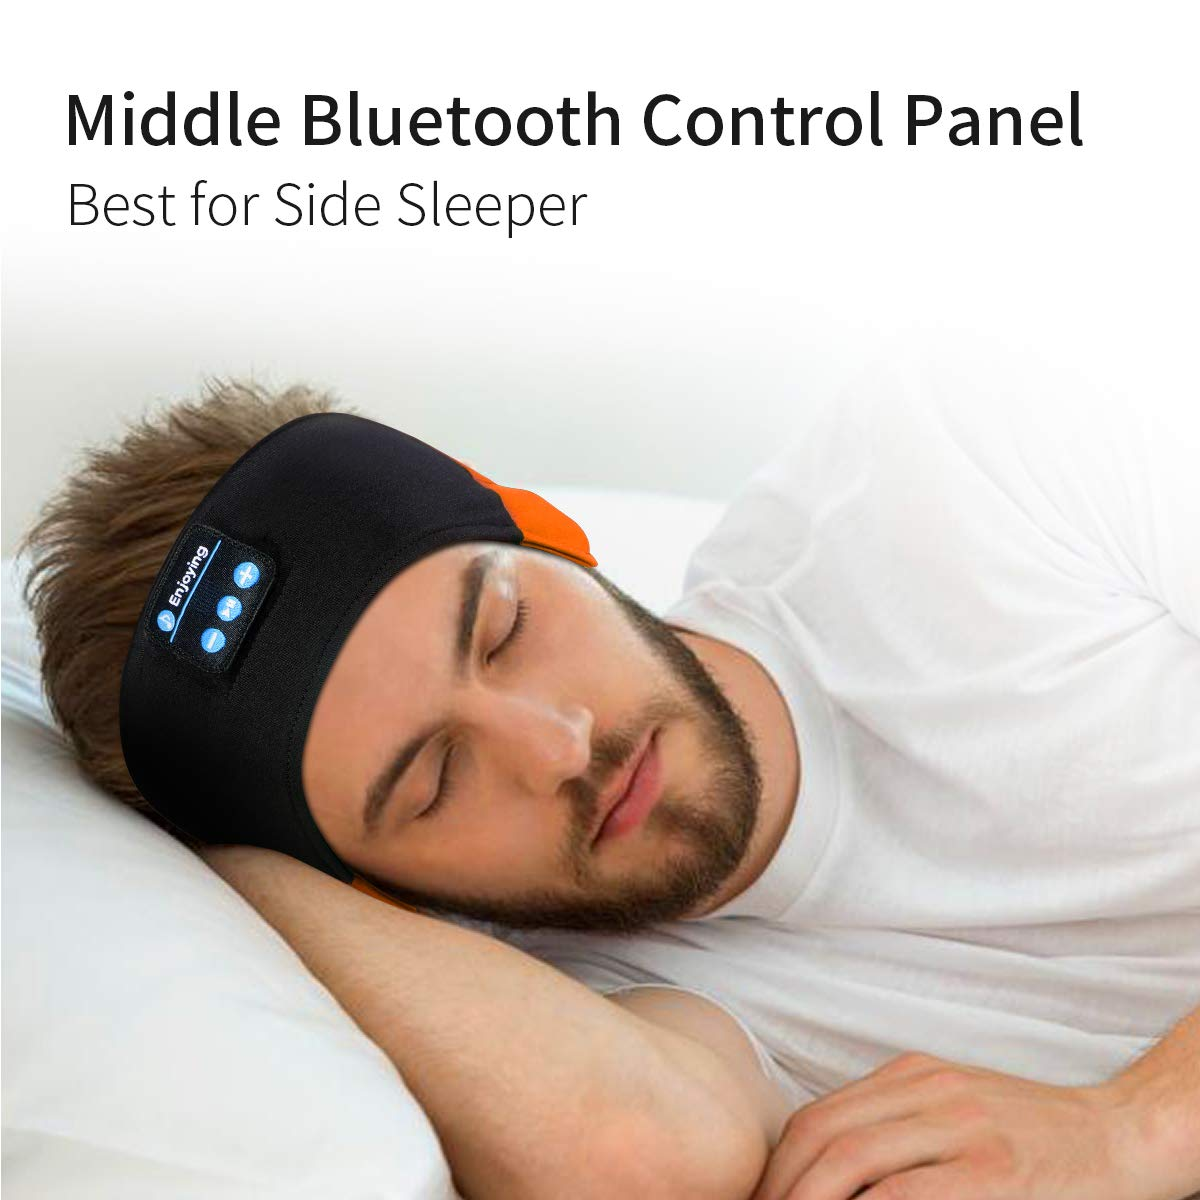 WU-MINGLU Bluetooth Headband Sleep Headphones, Wireless Music Sport Headbands Headsets Sleeping Headphone for Men,Women with Thin and Cool Fabric & Adjustable Earphones for Running, Yoga (Orange)